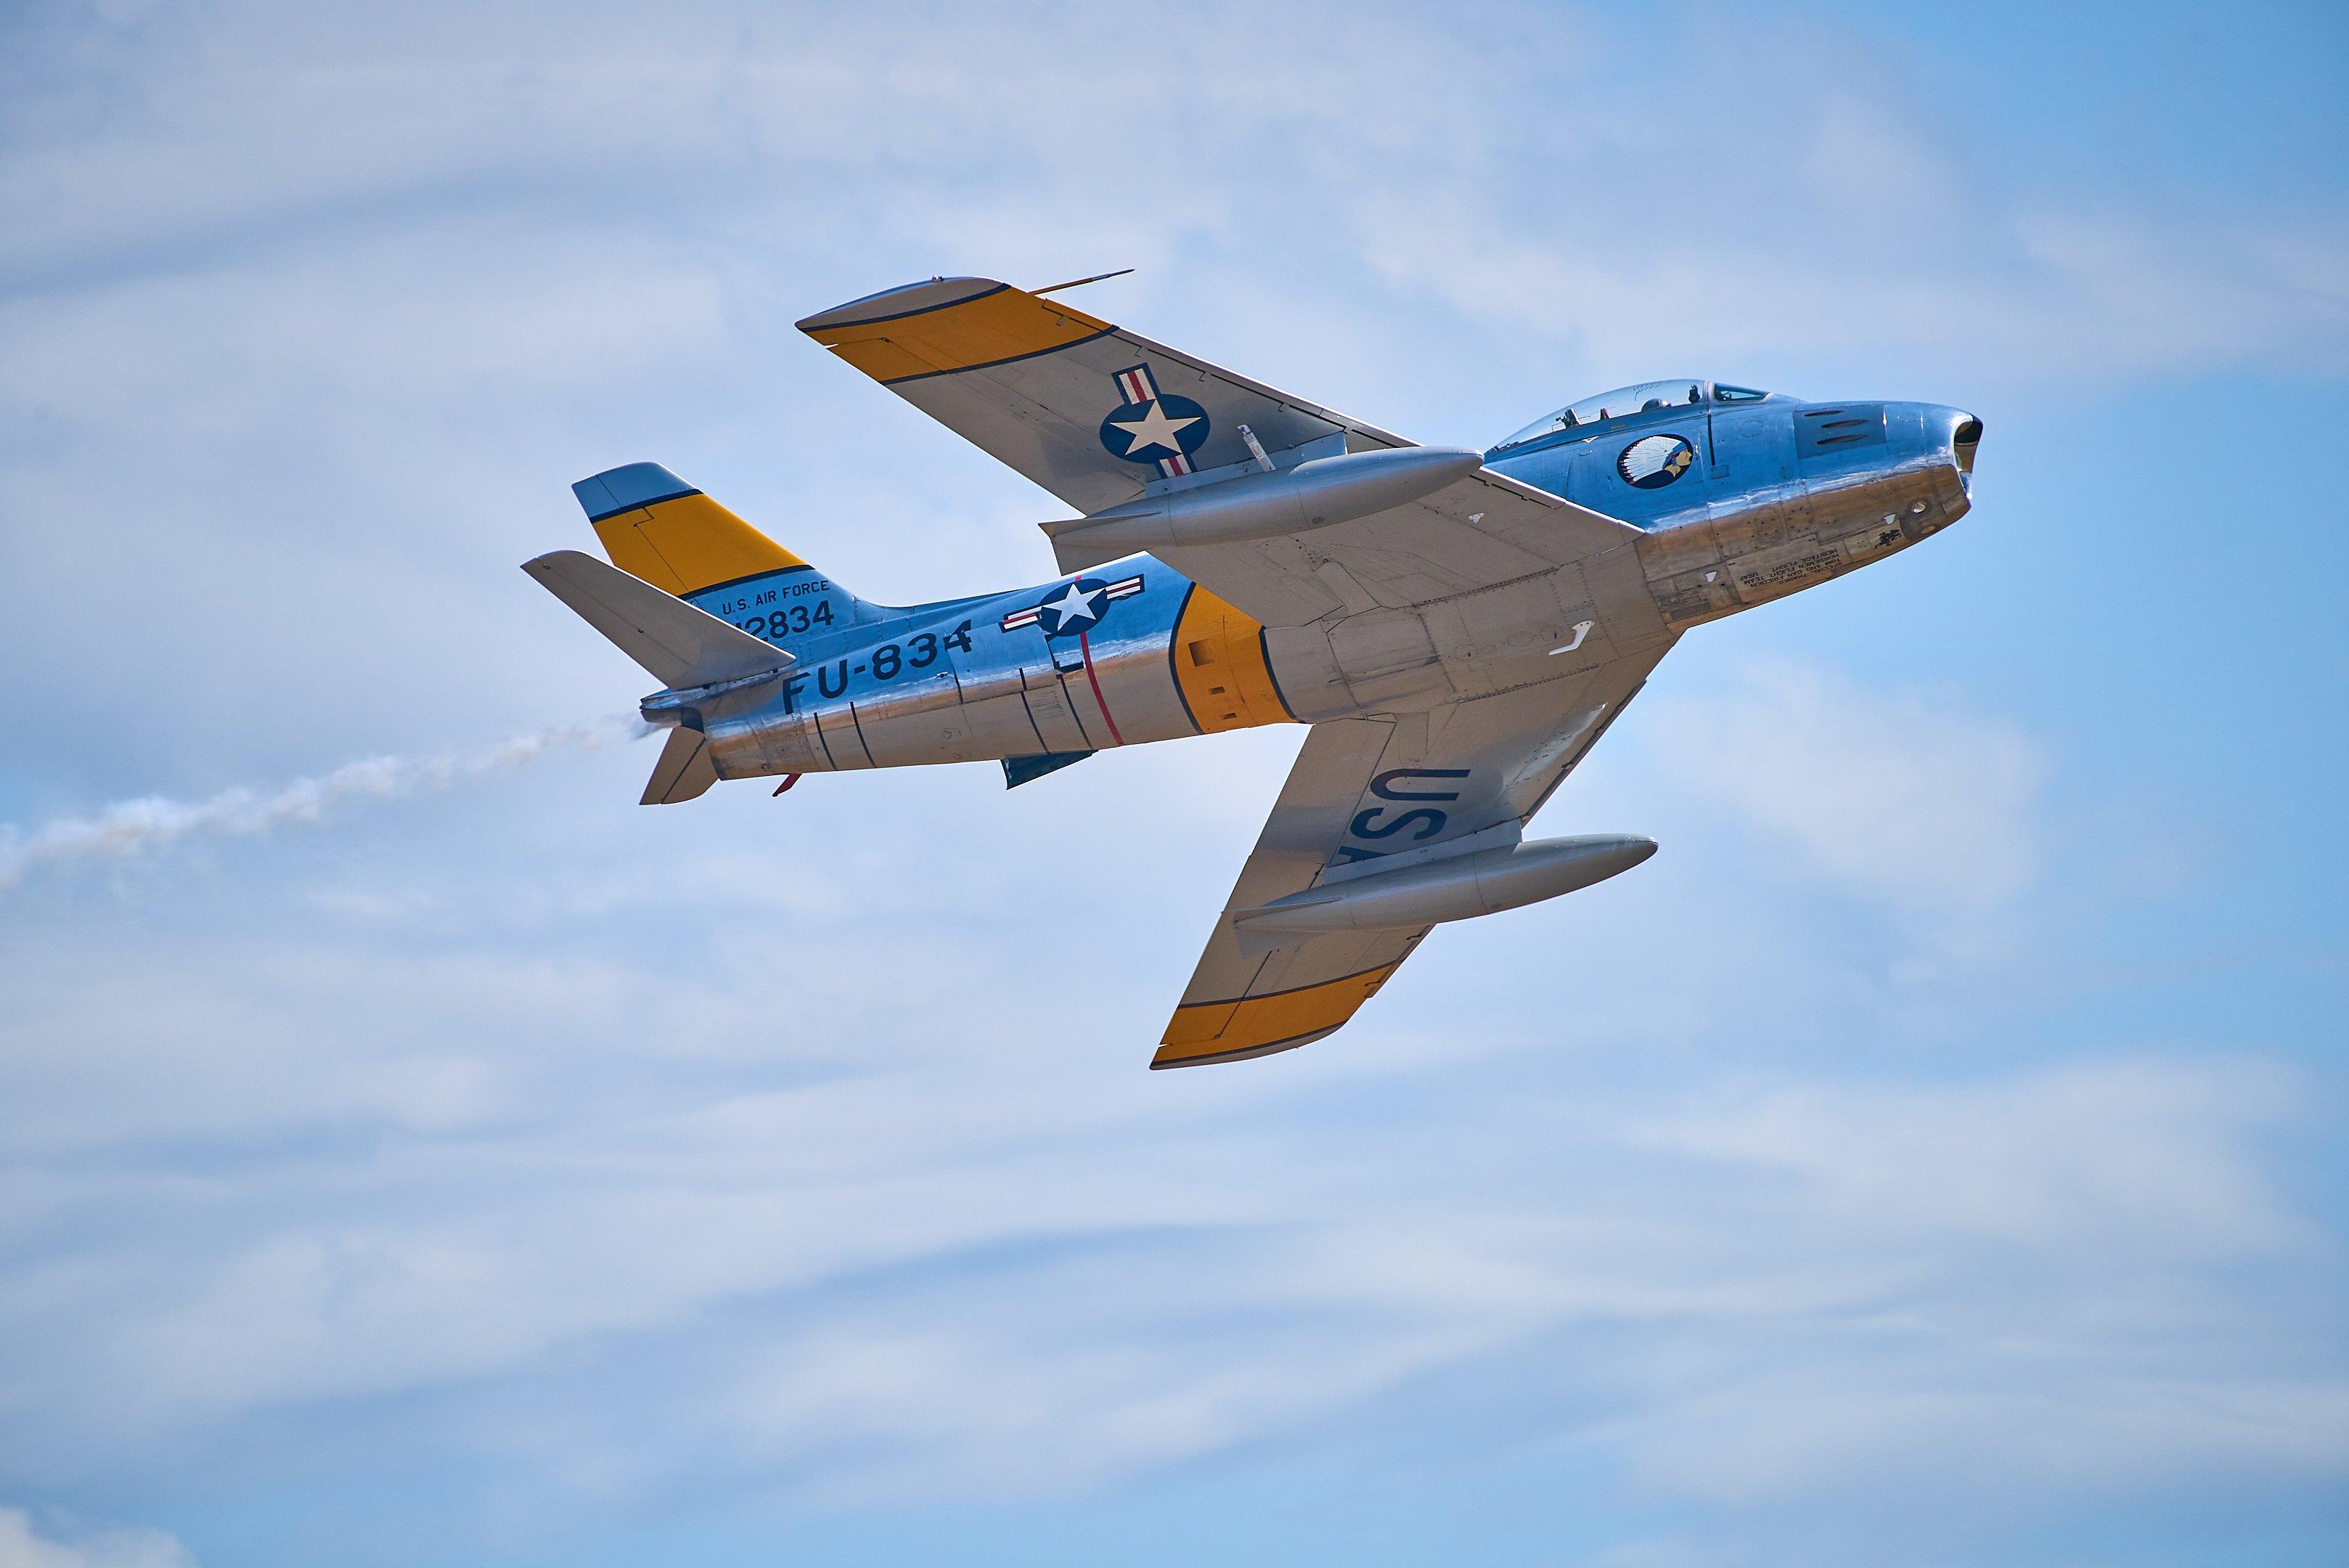 Abbotsford Airshow : 2017-08-13 : Jet Demo